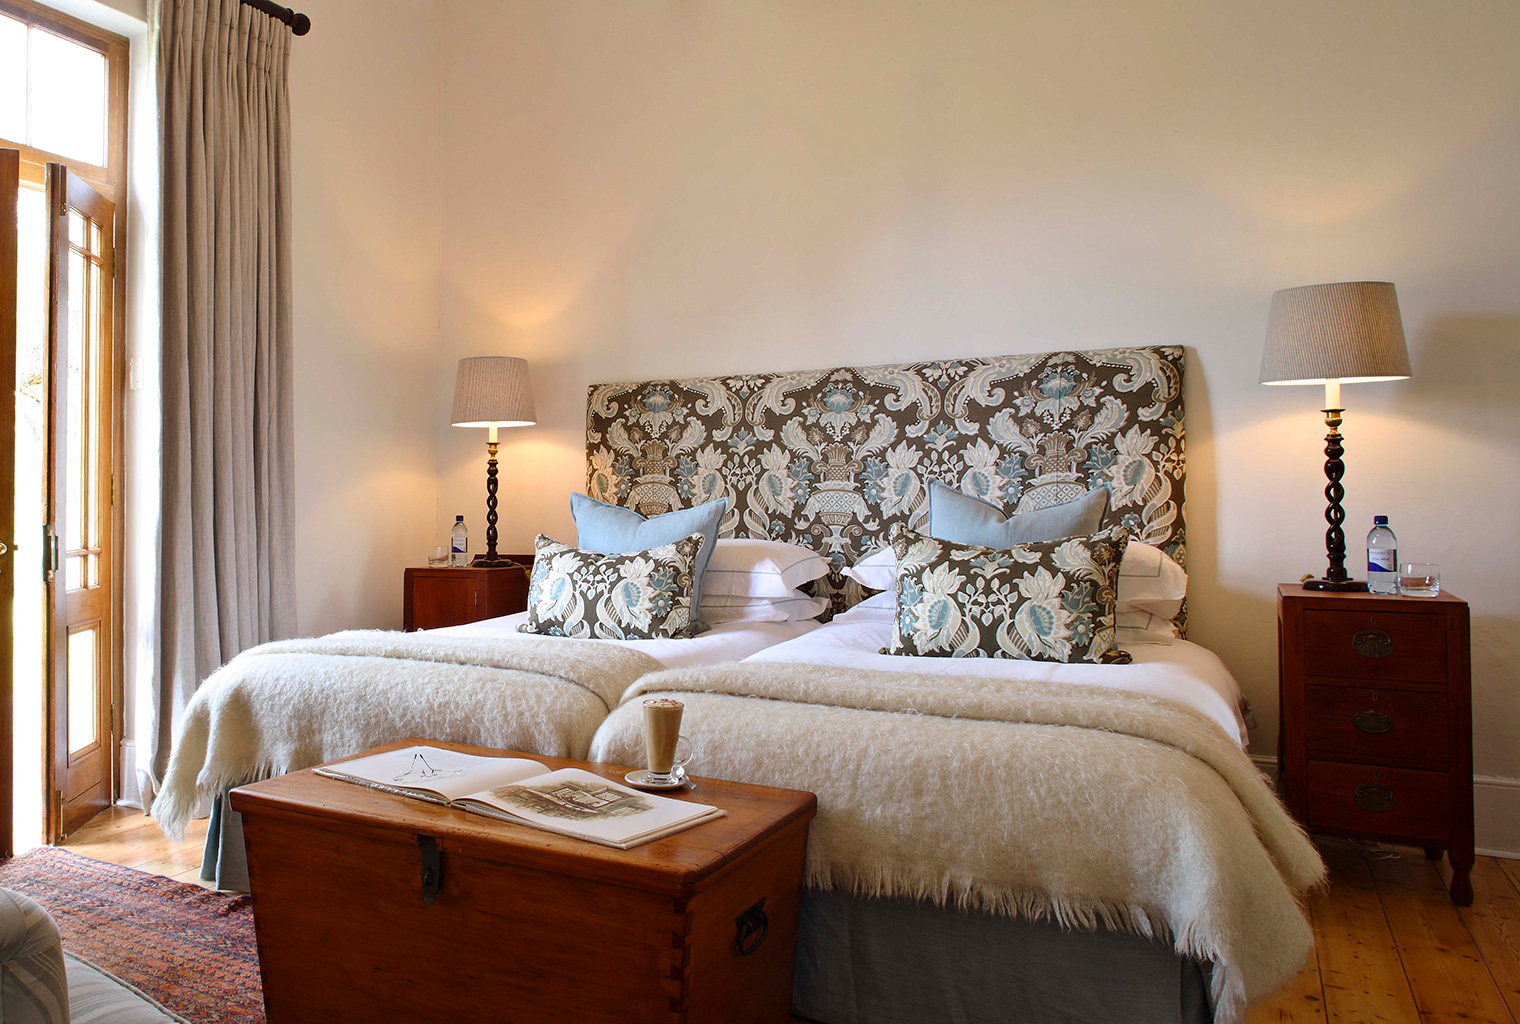 Uplands-Homestead-South-Africa-Bedroom